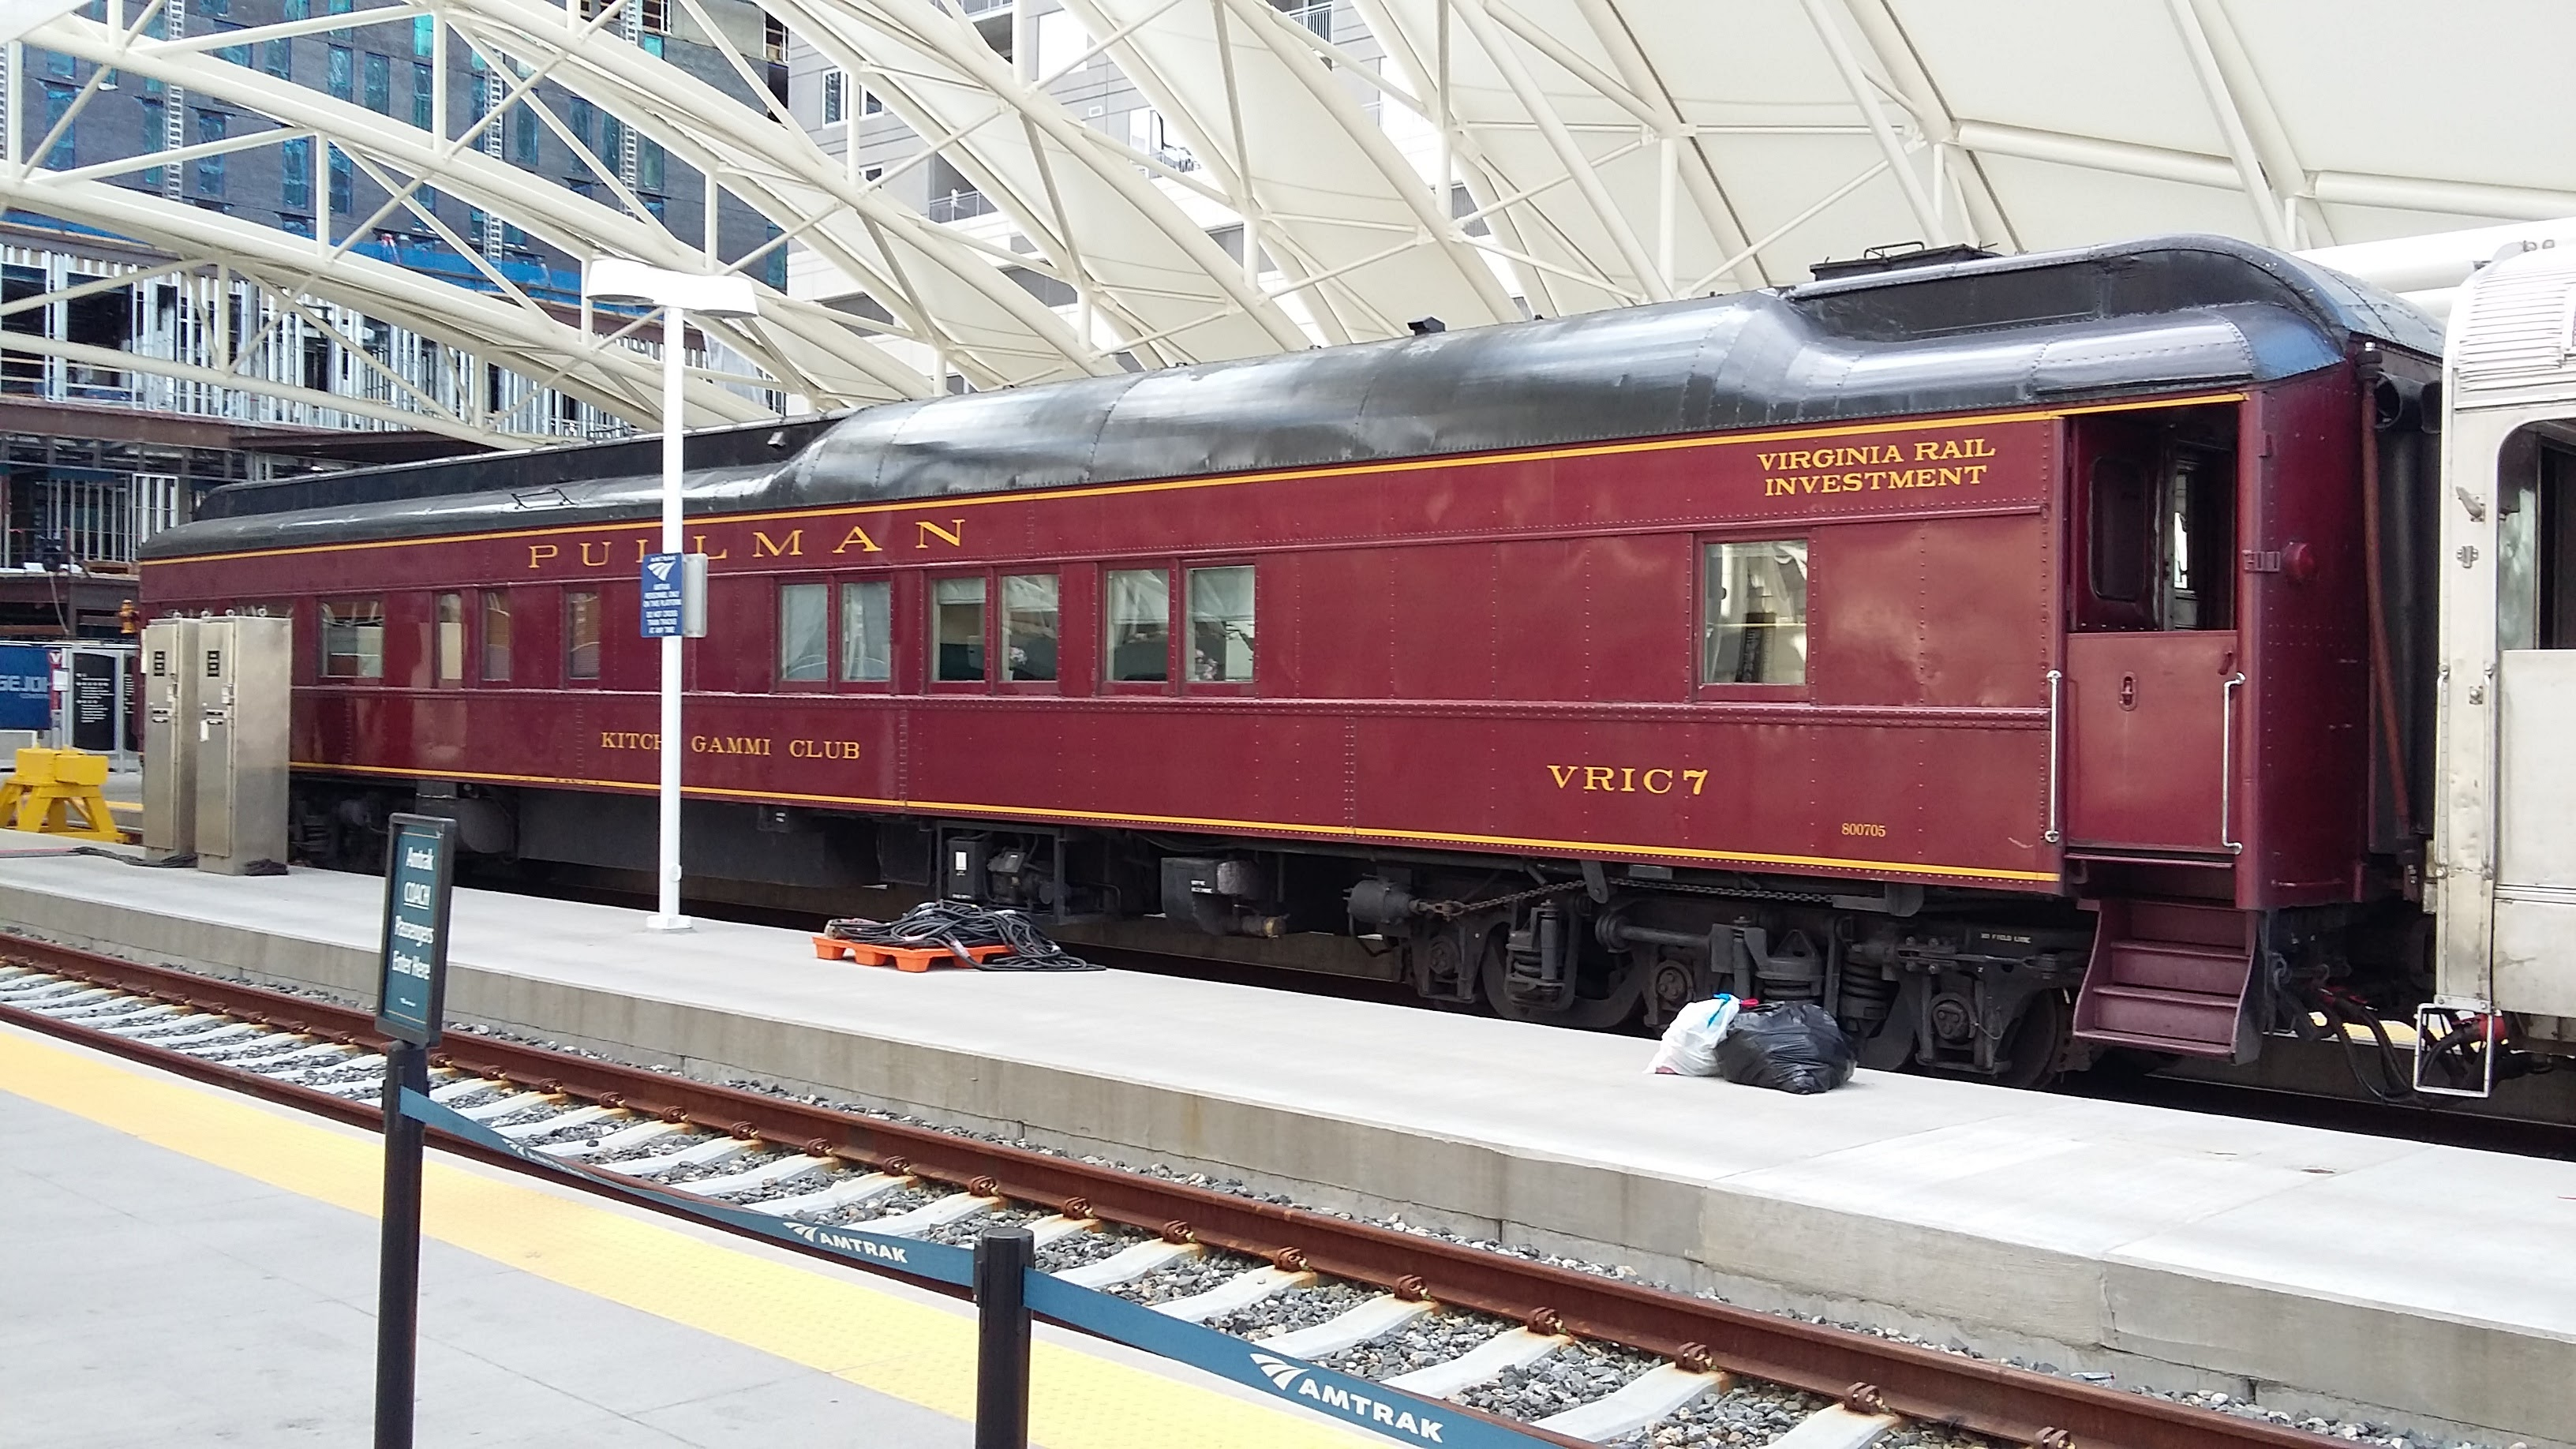 File:Pullman railcar 1, USTH, VRIC7, 2016-07-25.jpg - Wikimedia Commons